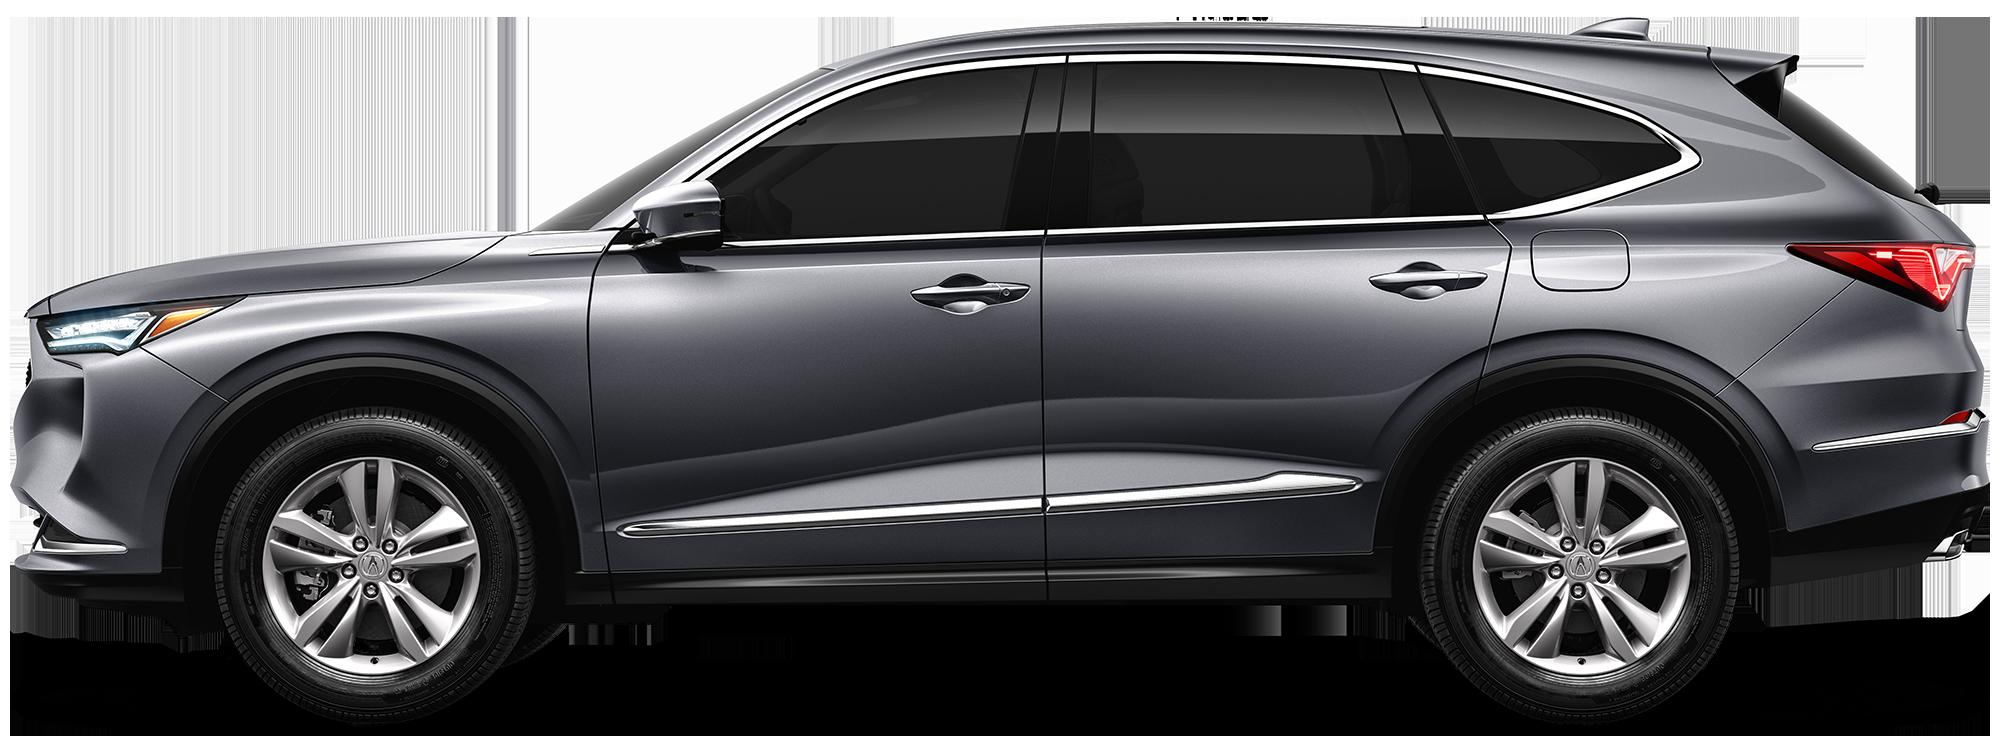 2022 Acura MDX SUV FWD